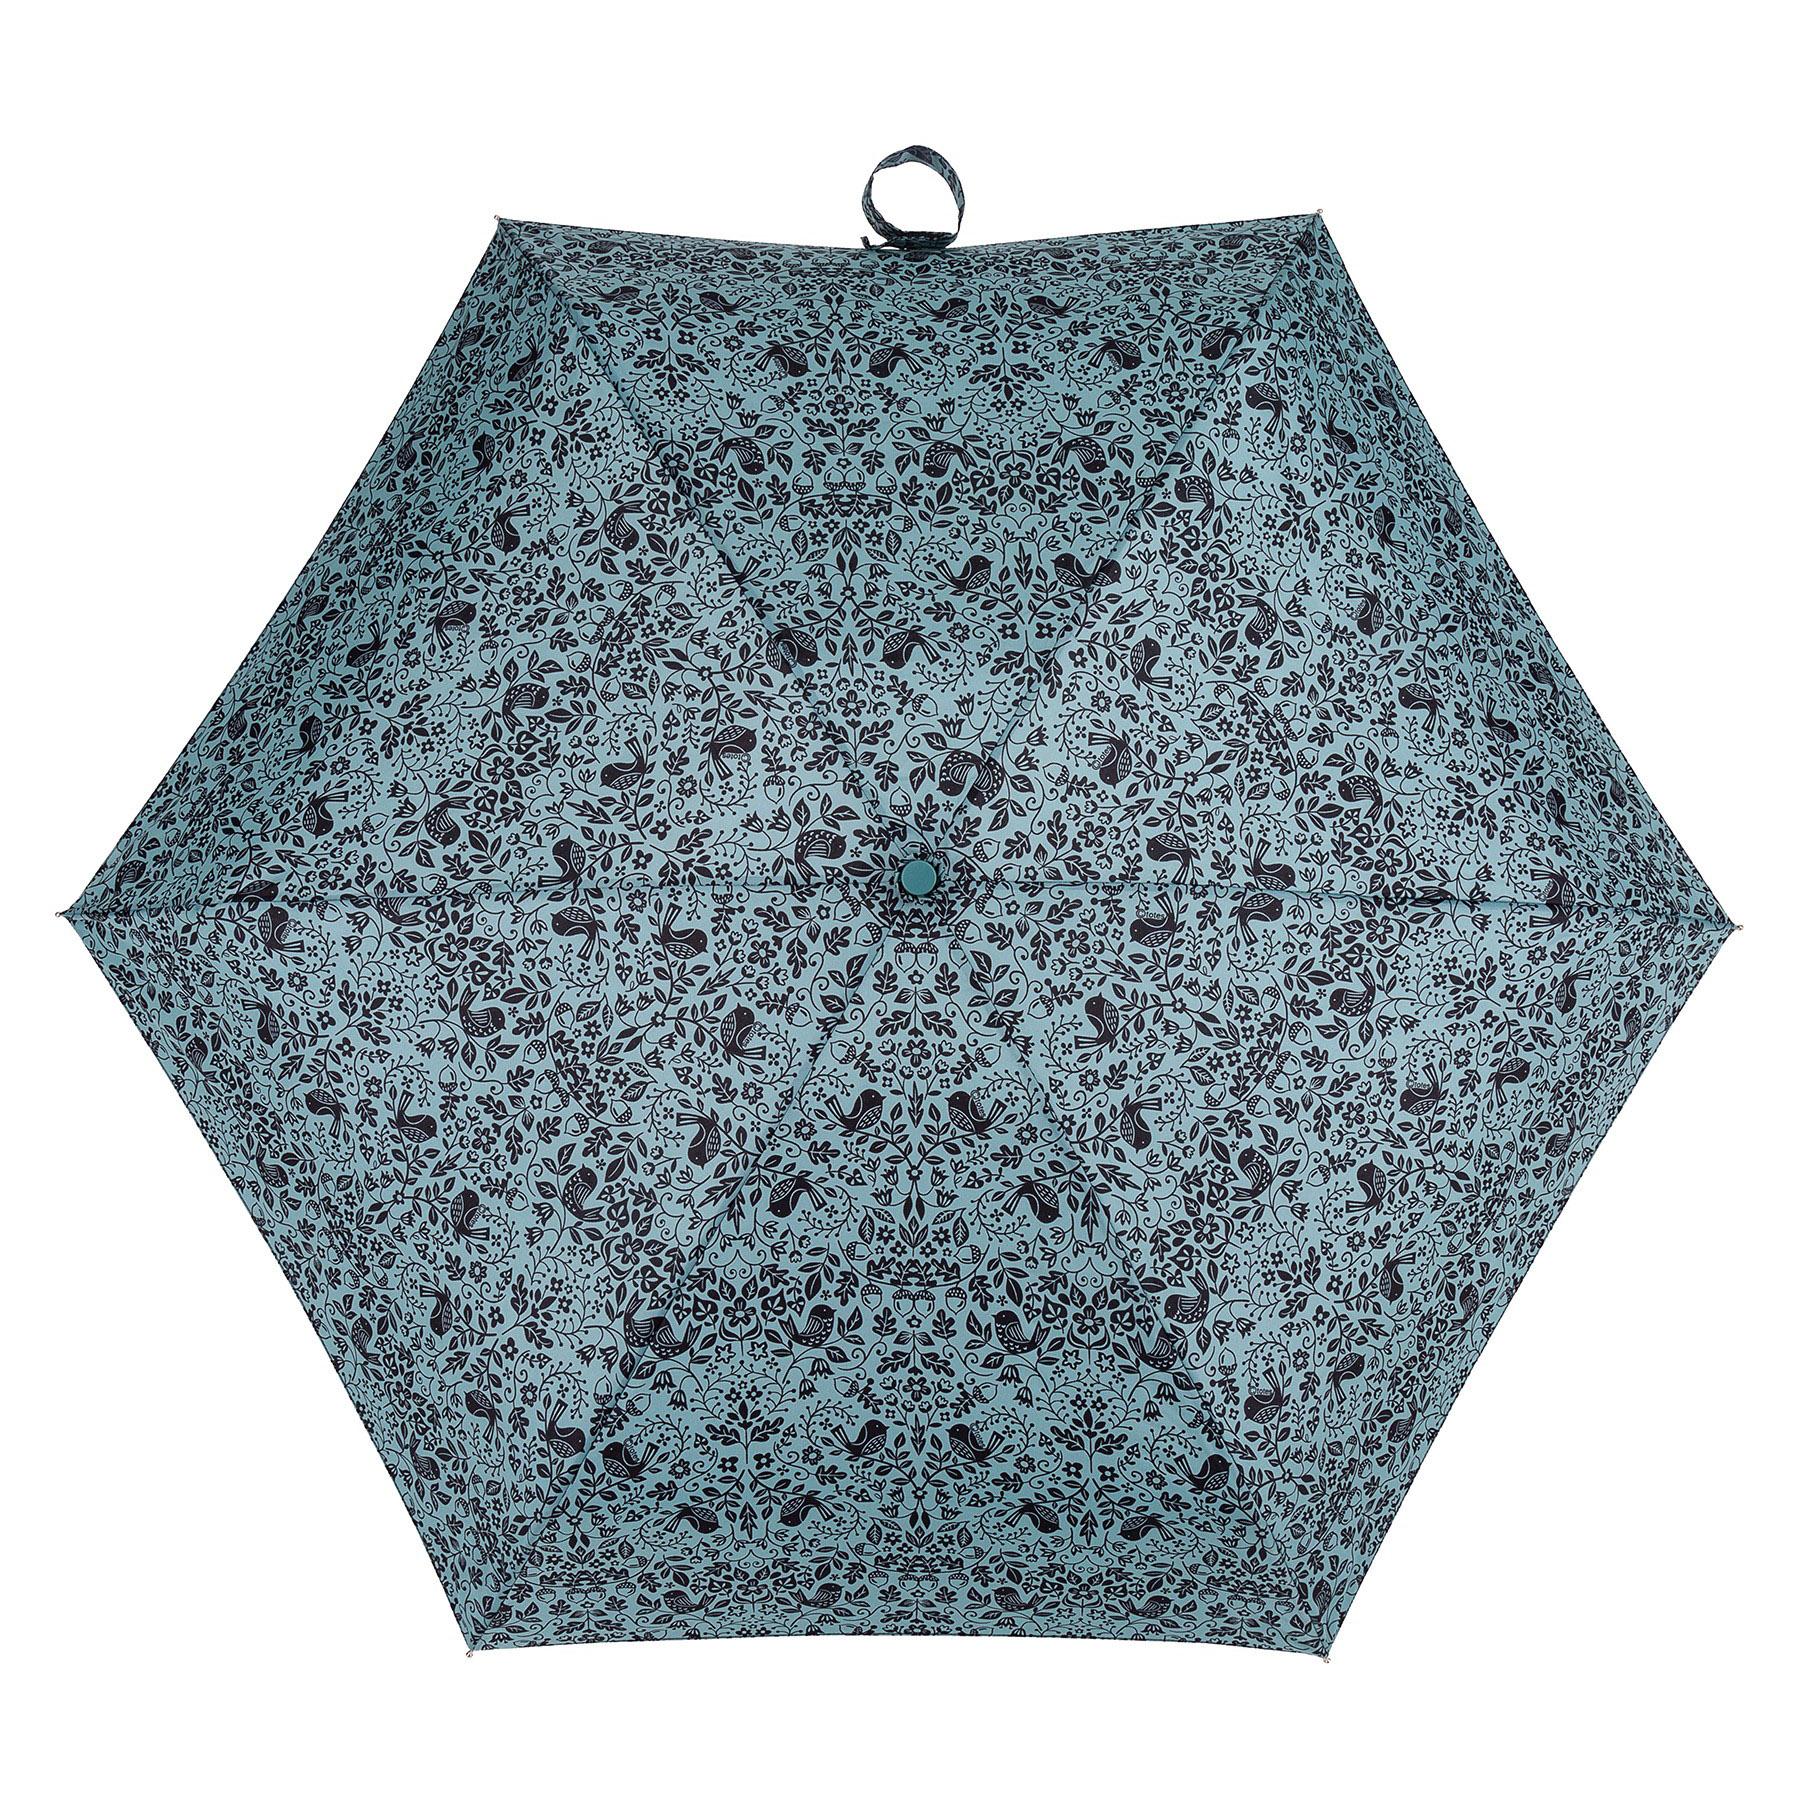 Totes Birds Umbrella £20